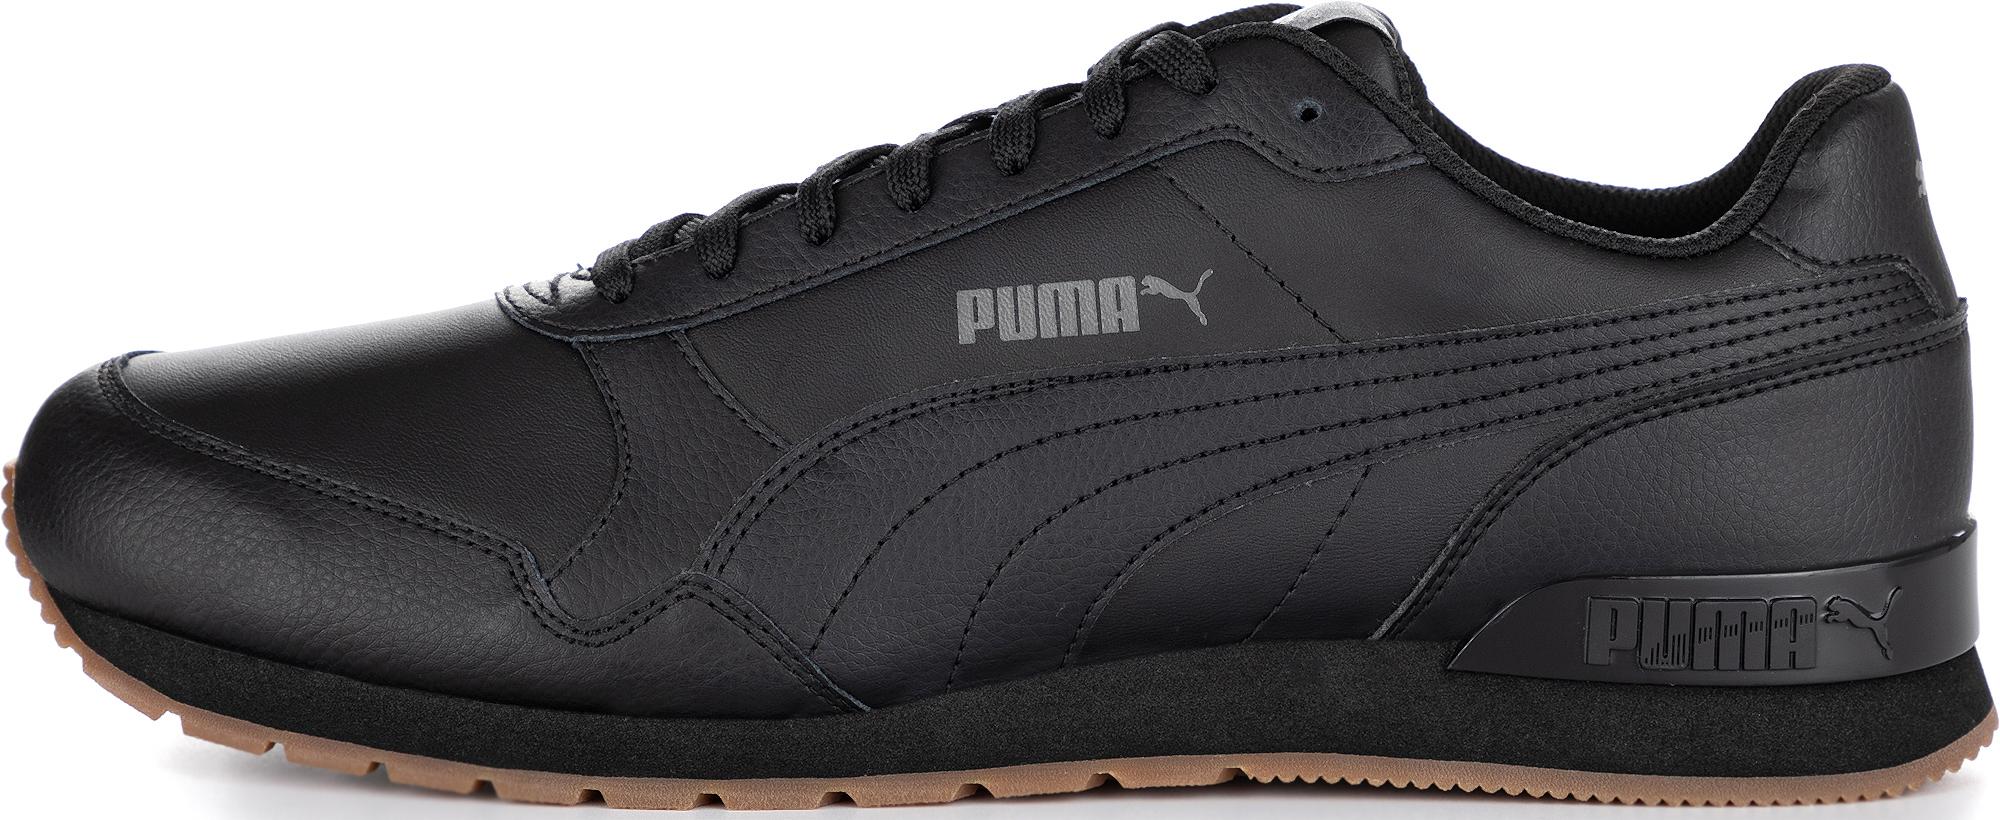 Puma Кроссовки женские Puma ST Runner v2 Full, размер 37,5 все цены